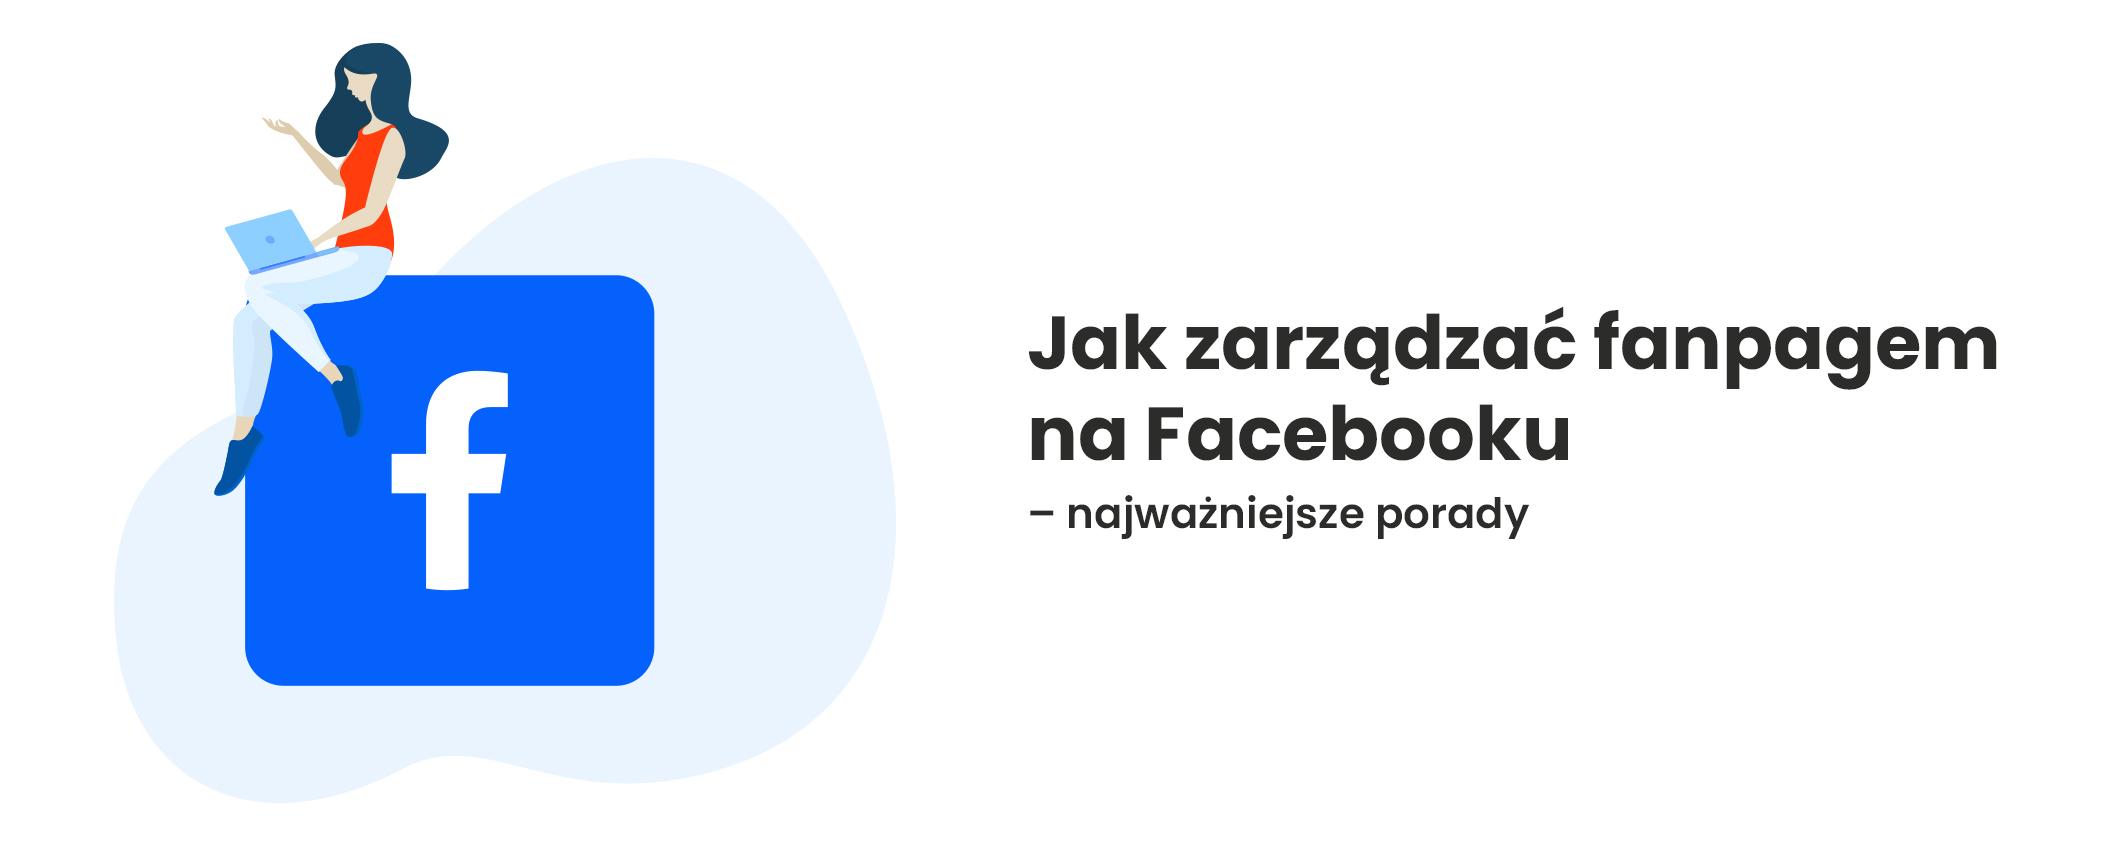 facebooku